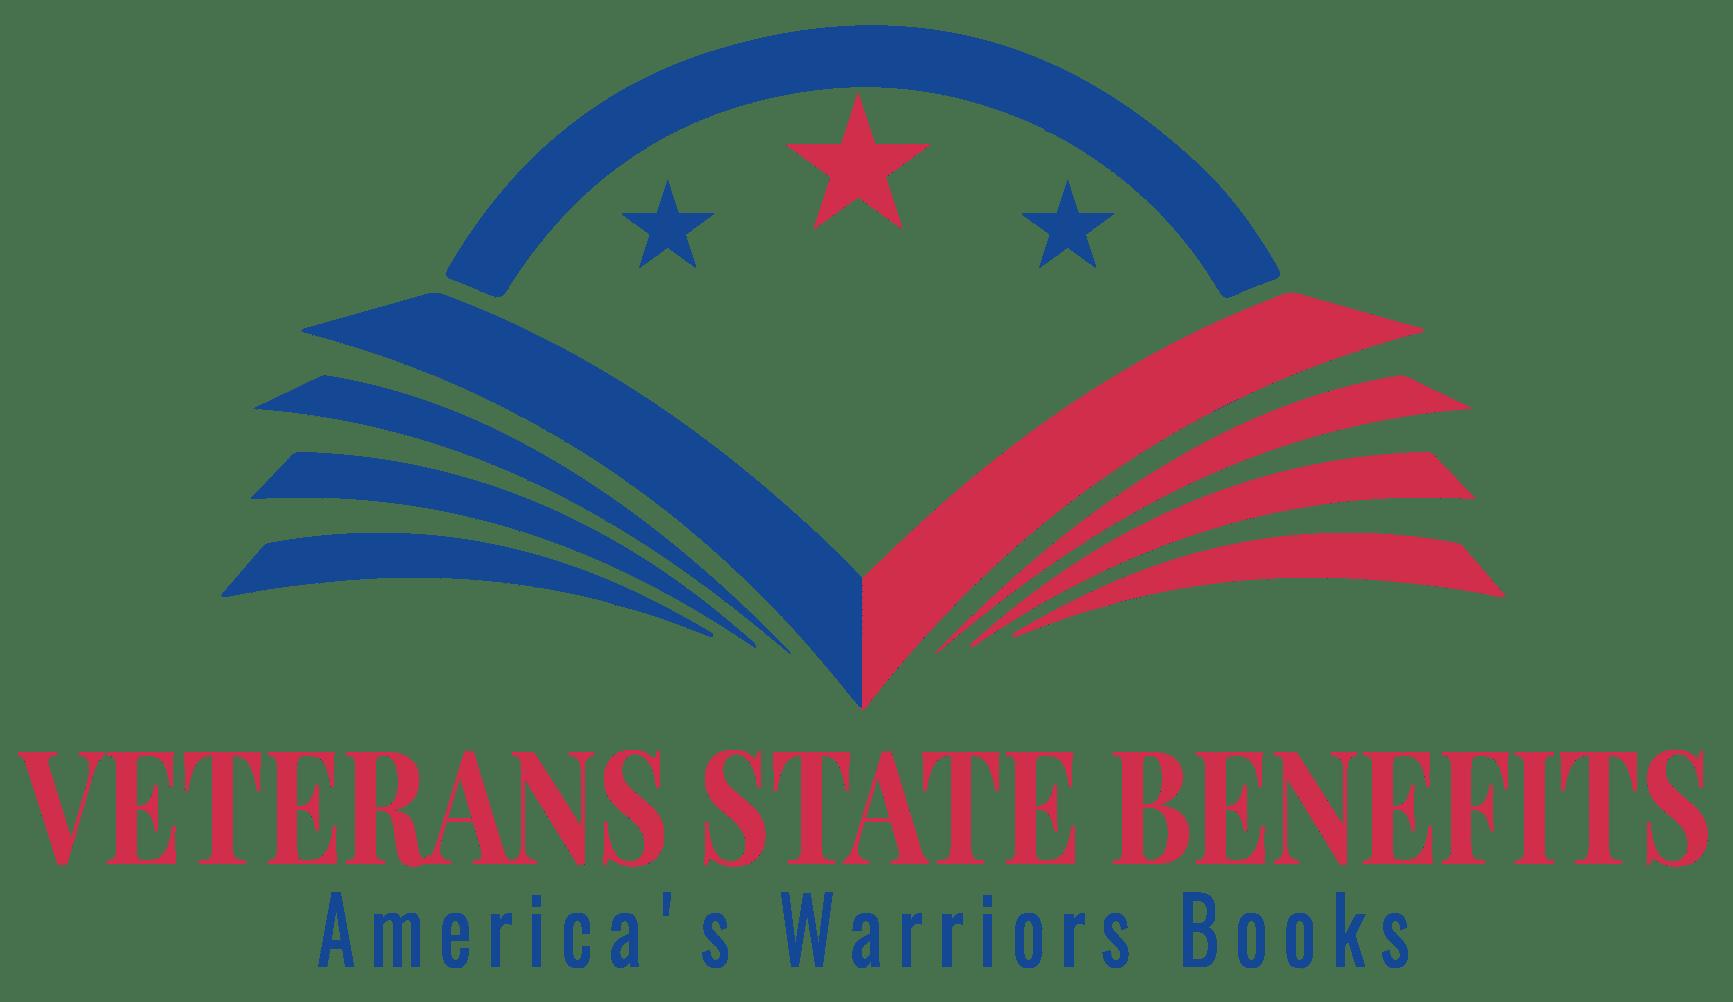 Veterans State Benefits Books